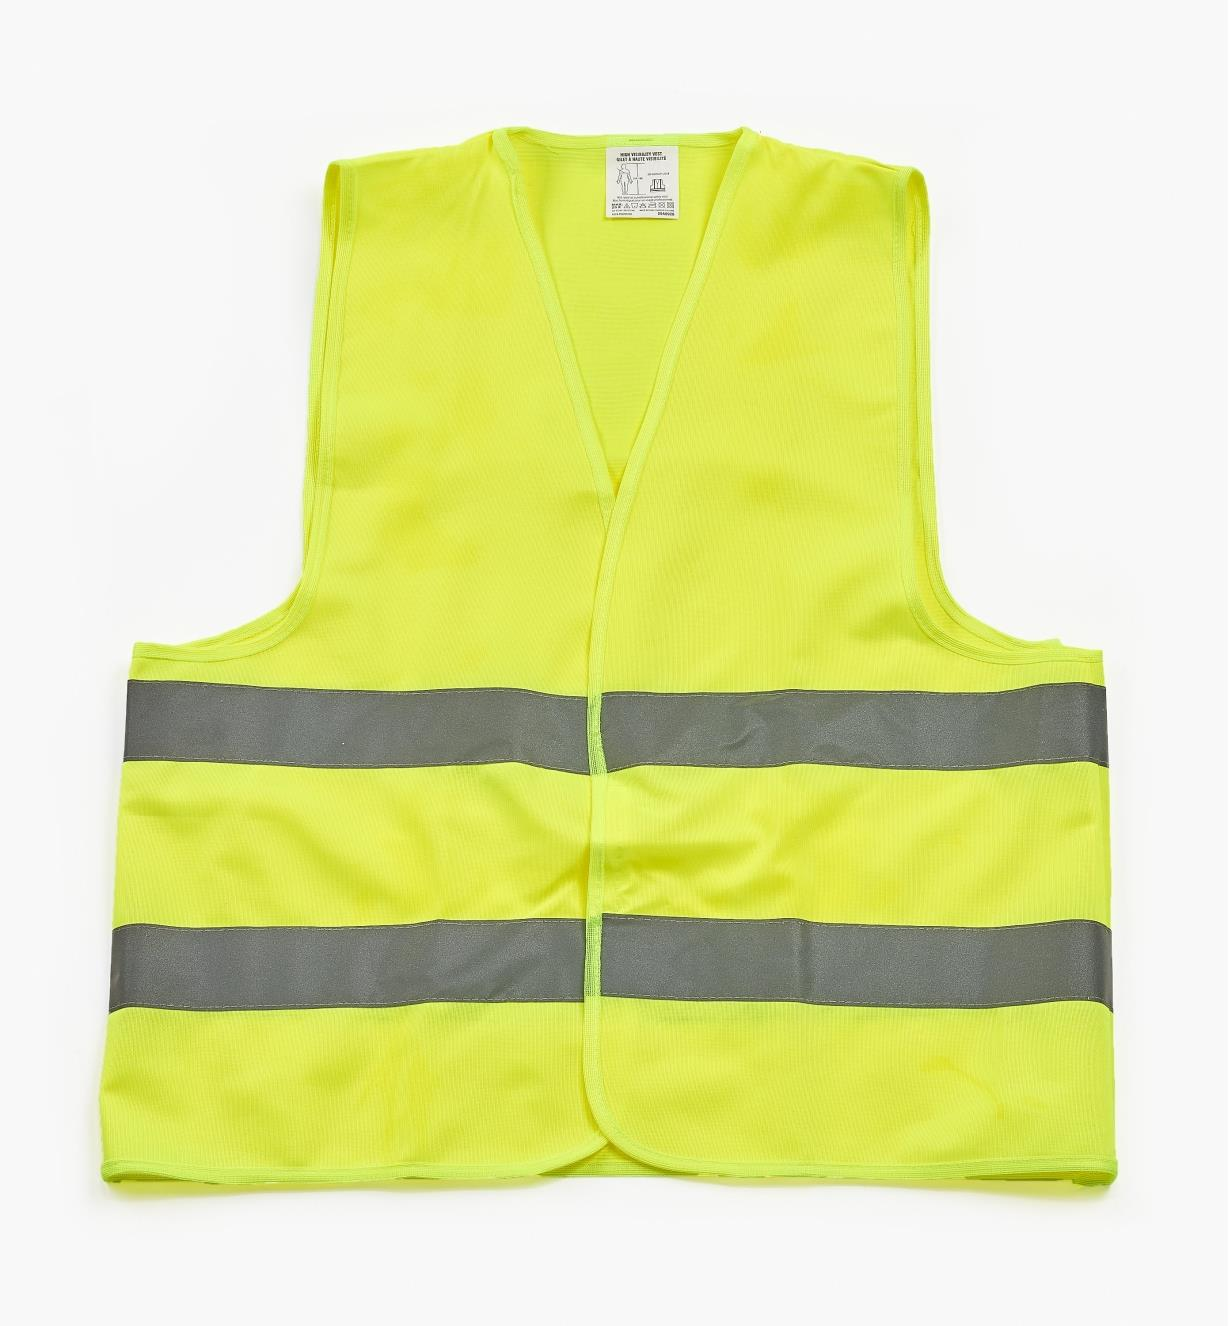 09A0927 - High-Visibility Vest, X-Large